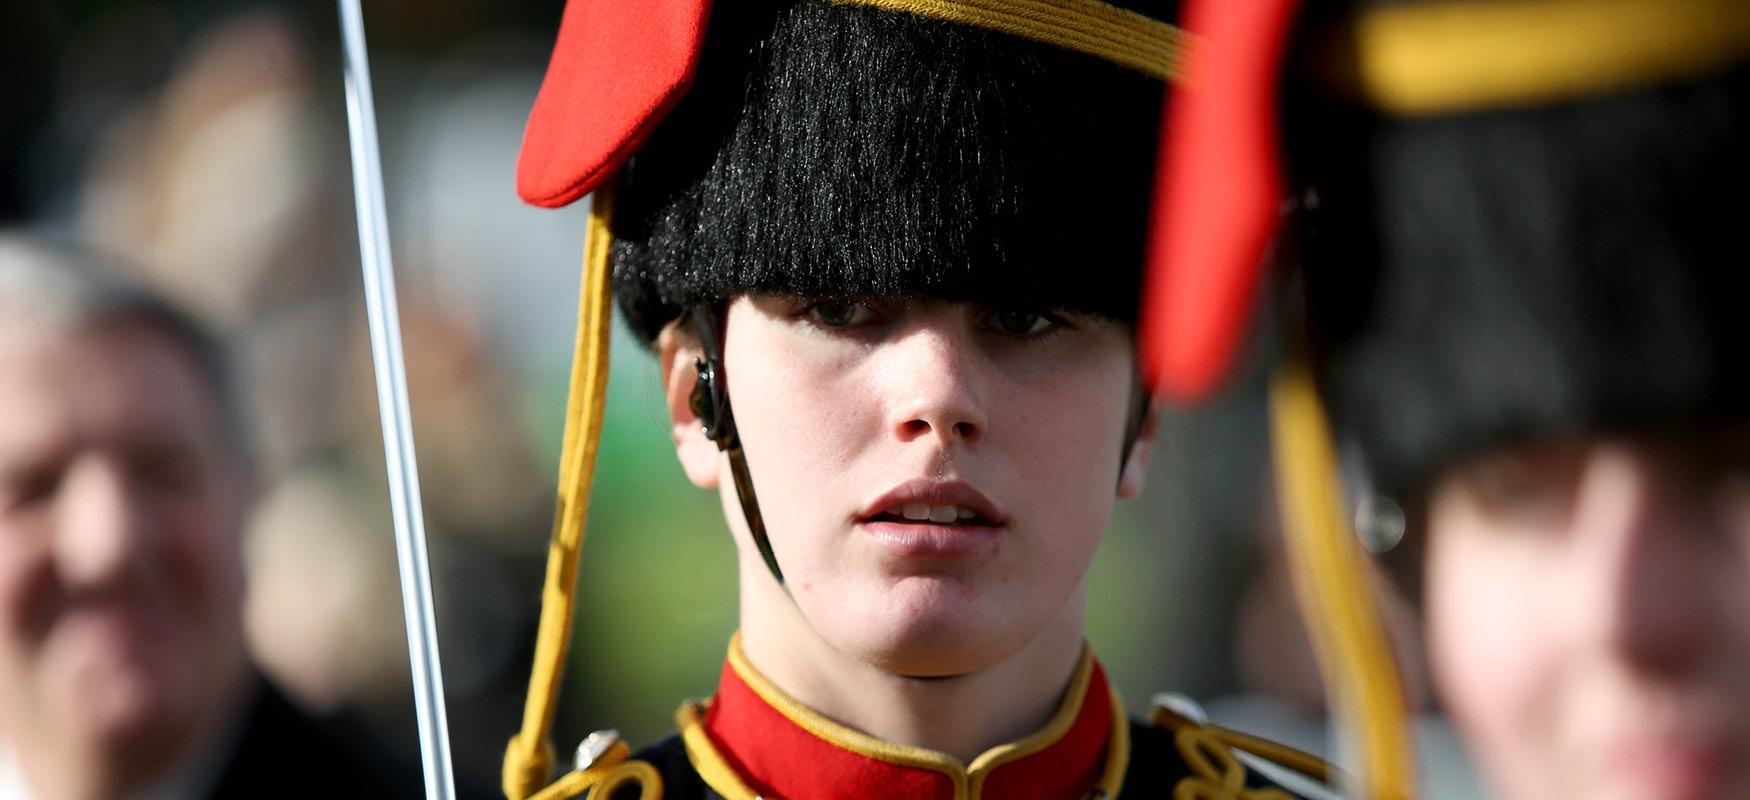 royal artillery, sandown park, esher, surrey, horseracing, sandown park, whats on, where to go